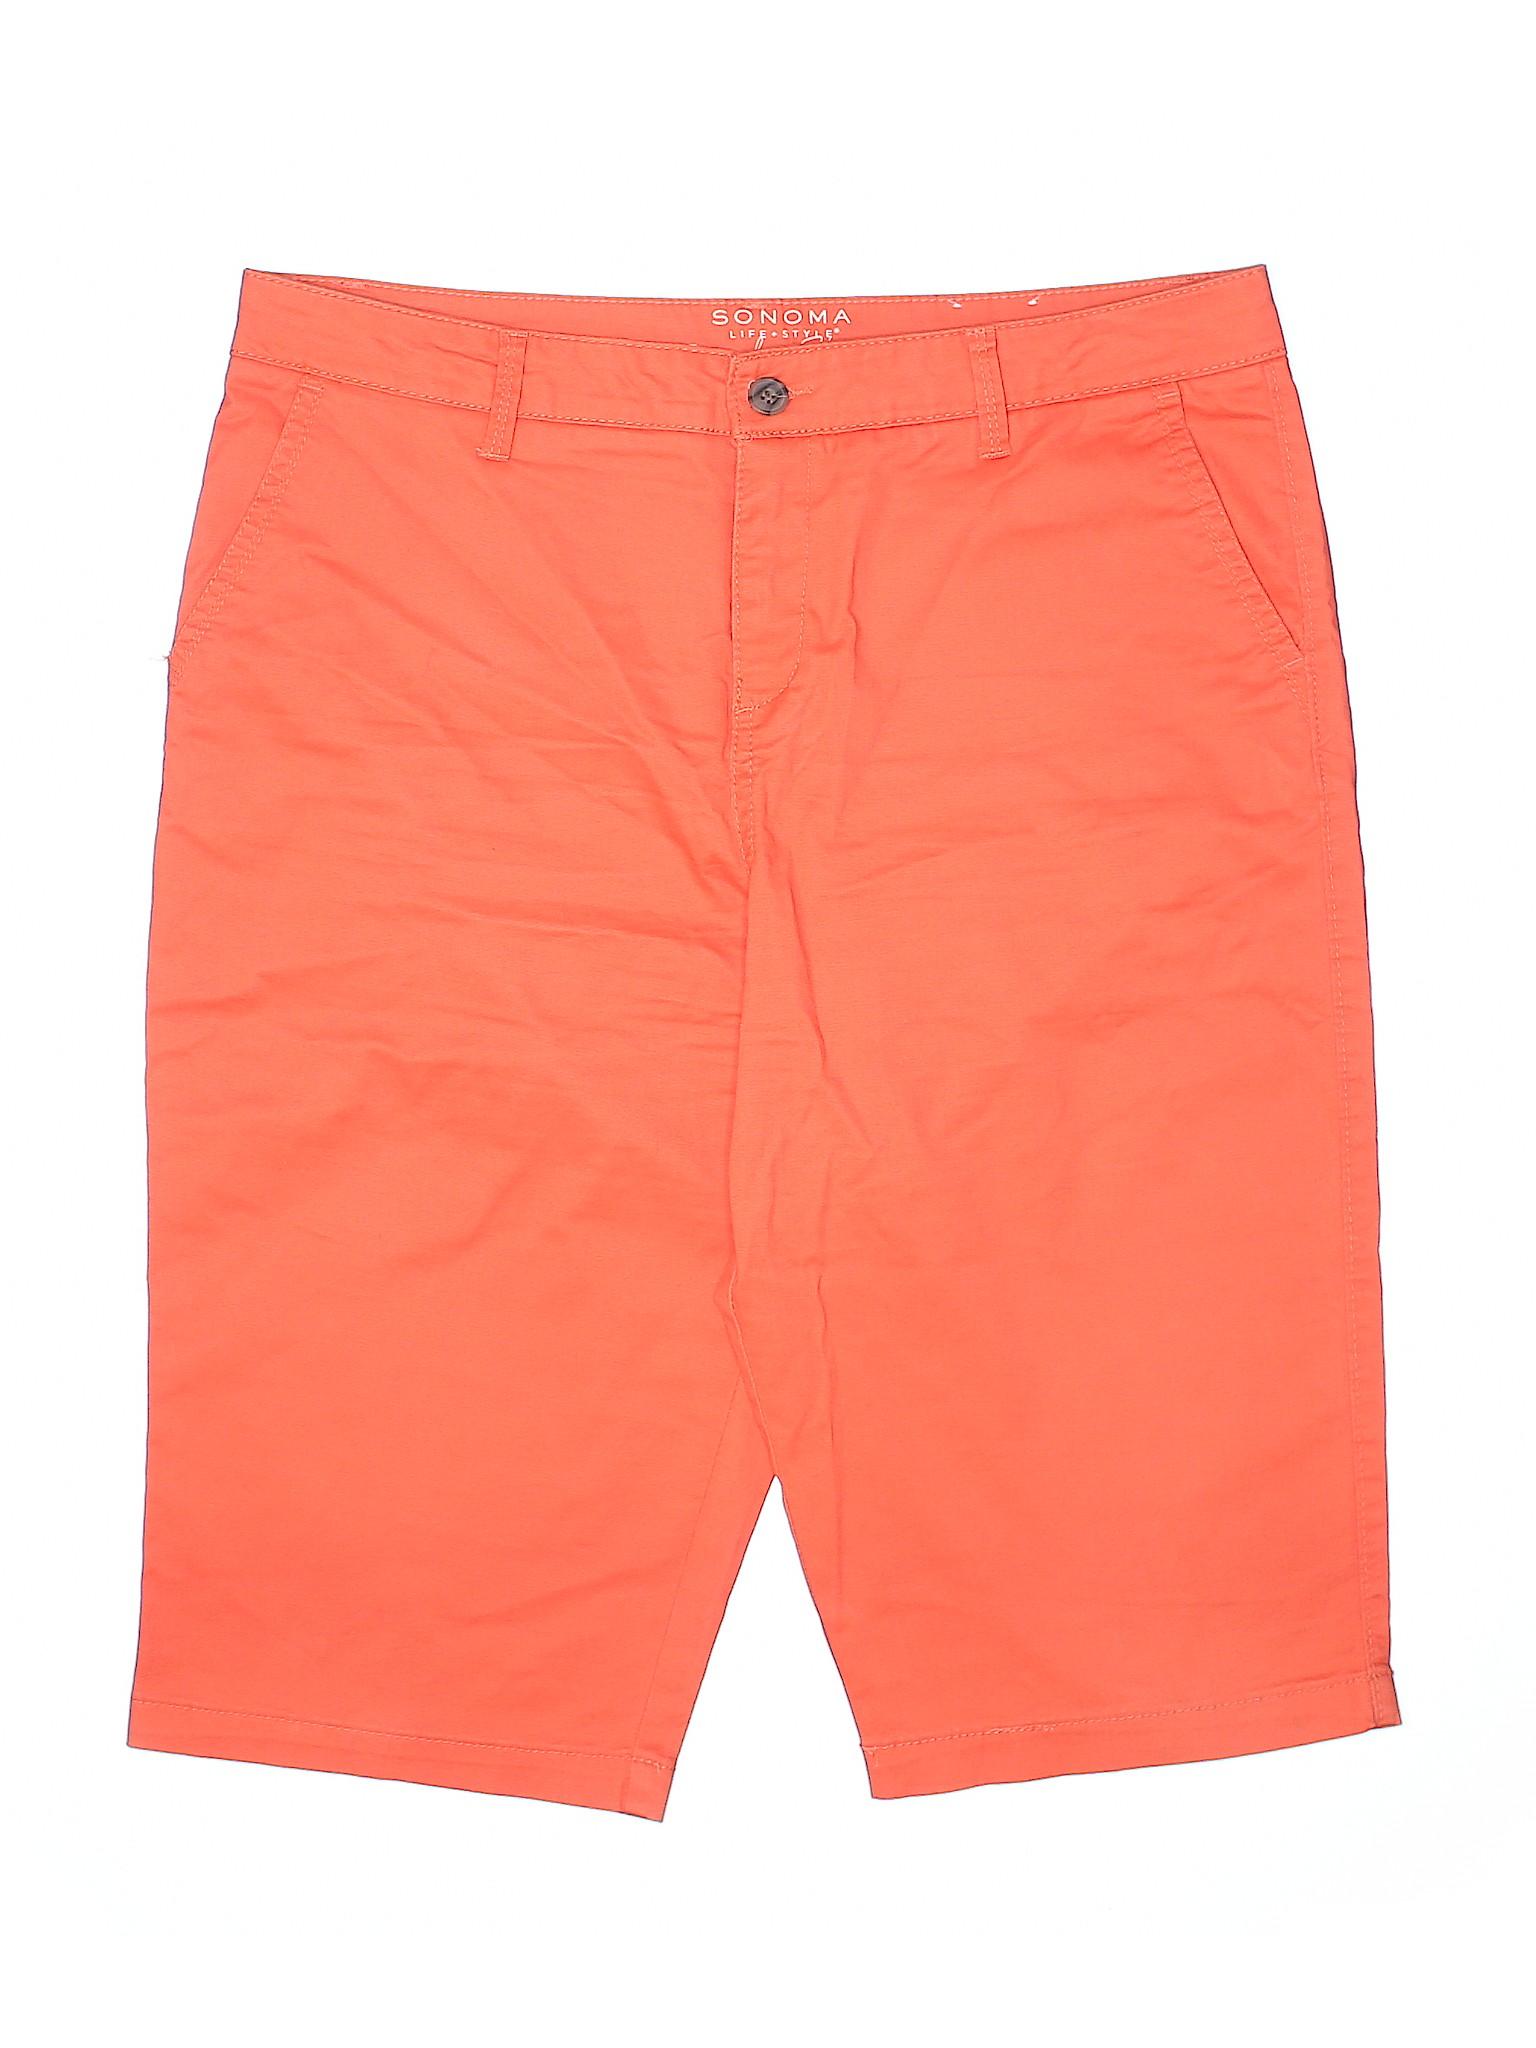 Boutique SONOMA Shorts SONOMA Boutique Shorts life style style life TZqZxSa